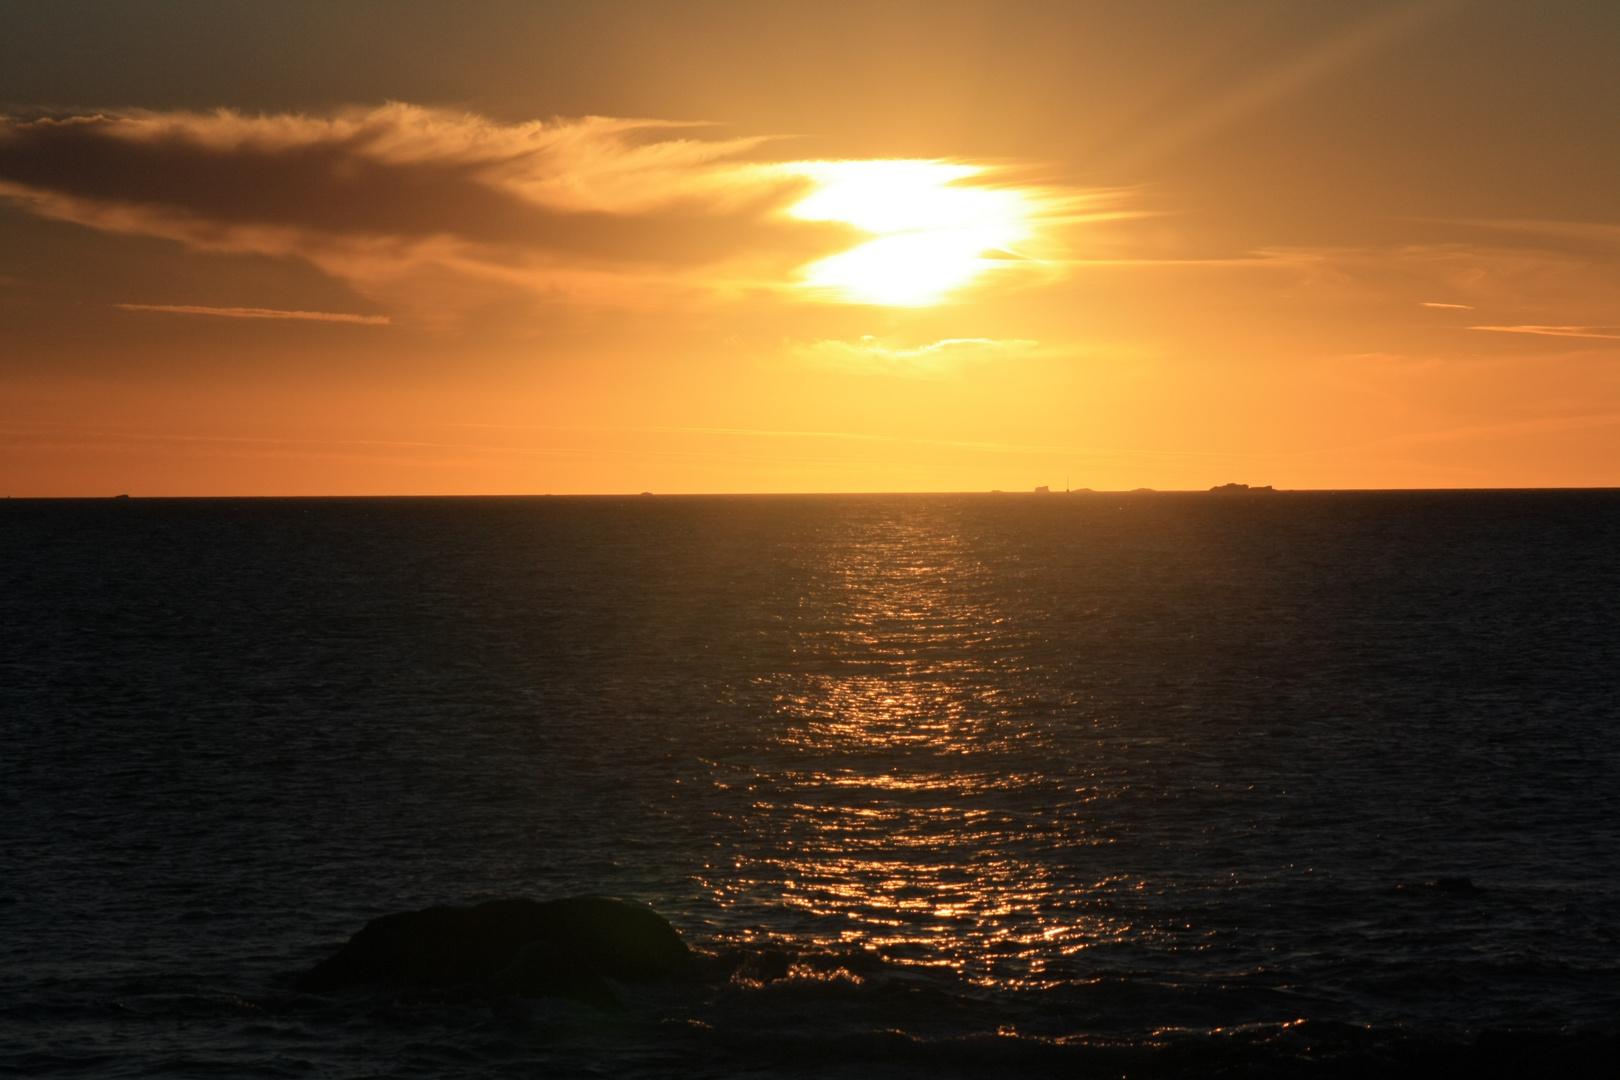 Sonnenuntergang in der Bretagne